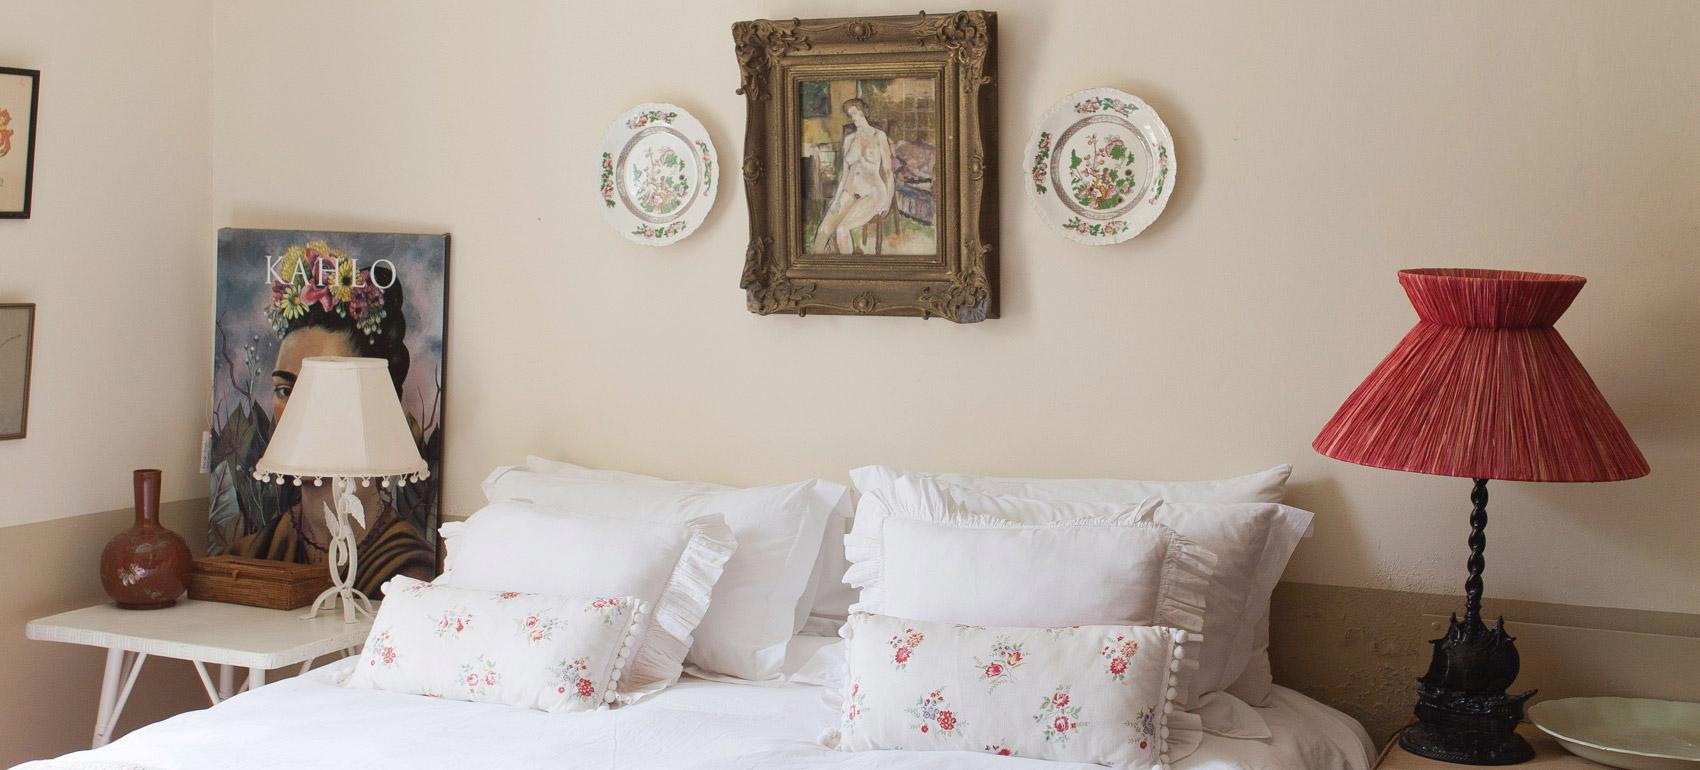 bloomsbury-cottage-gallery-07